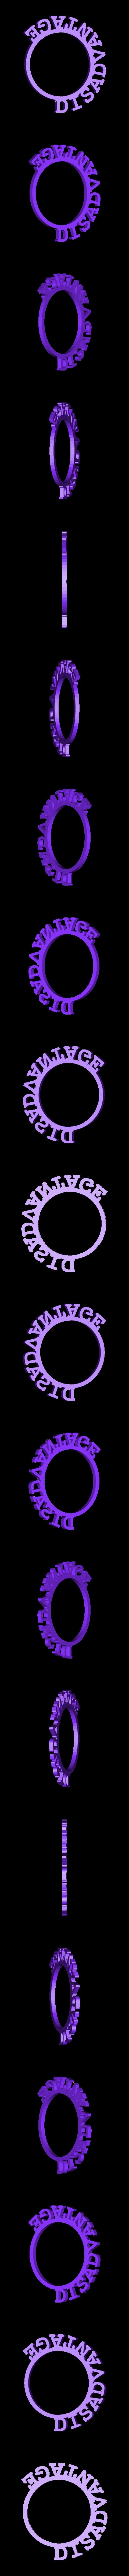 LRingDisadvantage.stl Download STL file D&D Condition Rings • 3D printable design, Jinja